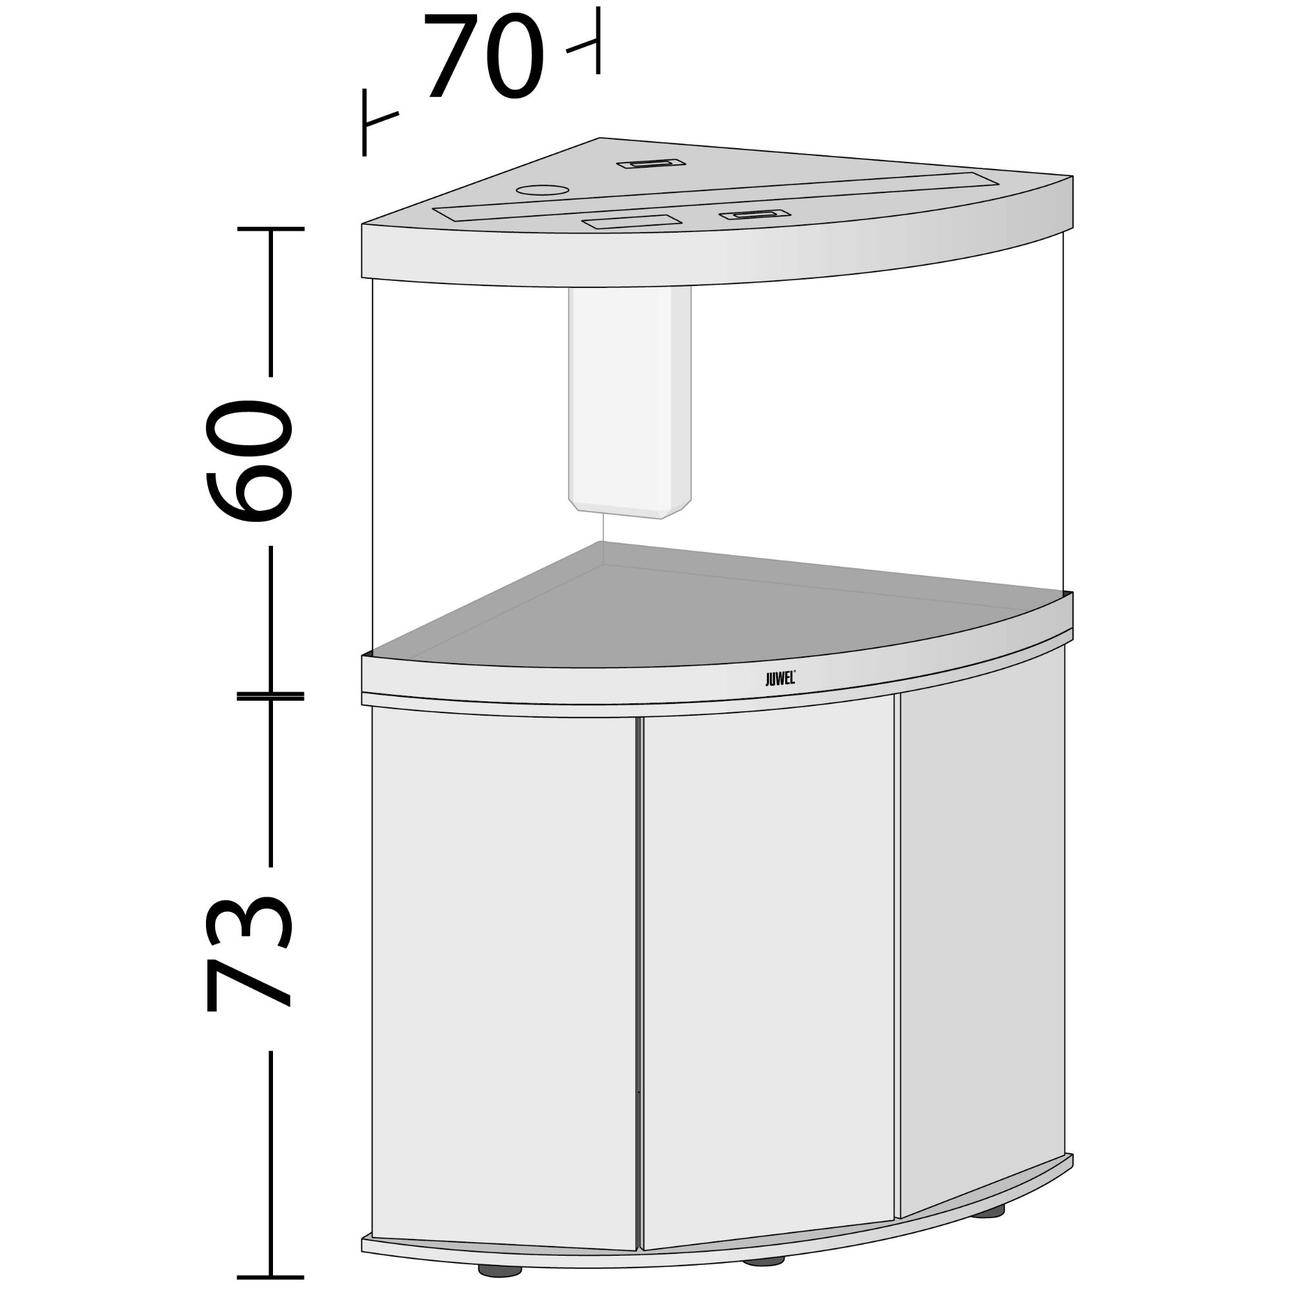 Juwel Trigon 190 LED Eck-Aquarium mit Unterschrank Bild 5